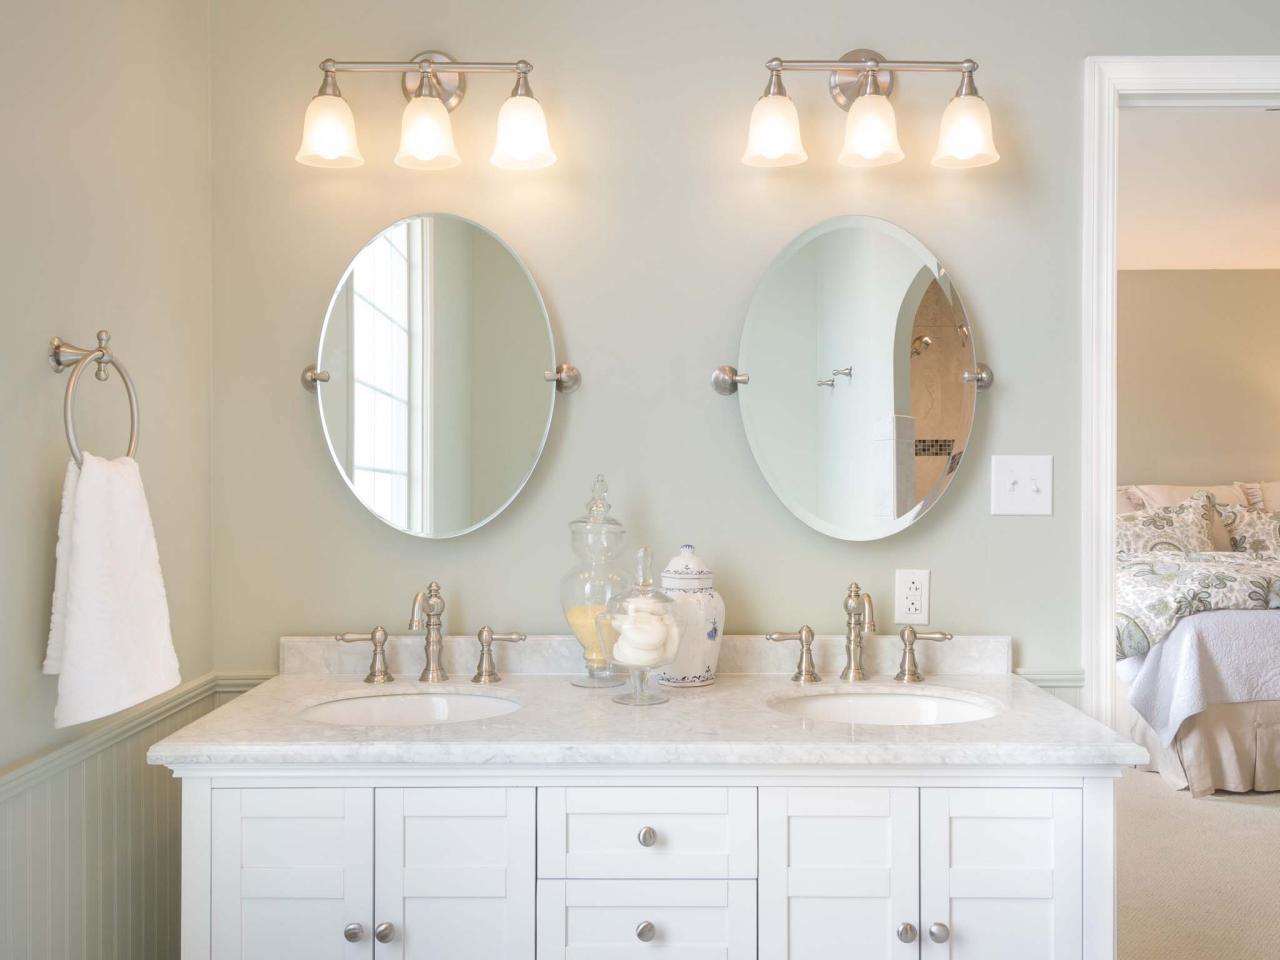 Door Bathroom Mirror Length Diy Bevel Likable Tiles Decor Pertaining To Thornbury Oval Bevel Frameless Wall Mirrors (View 20 of 20)